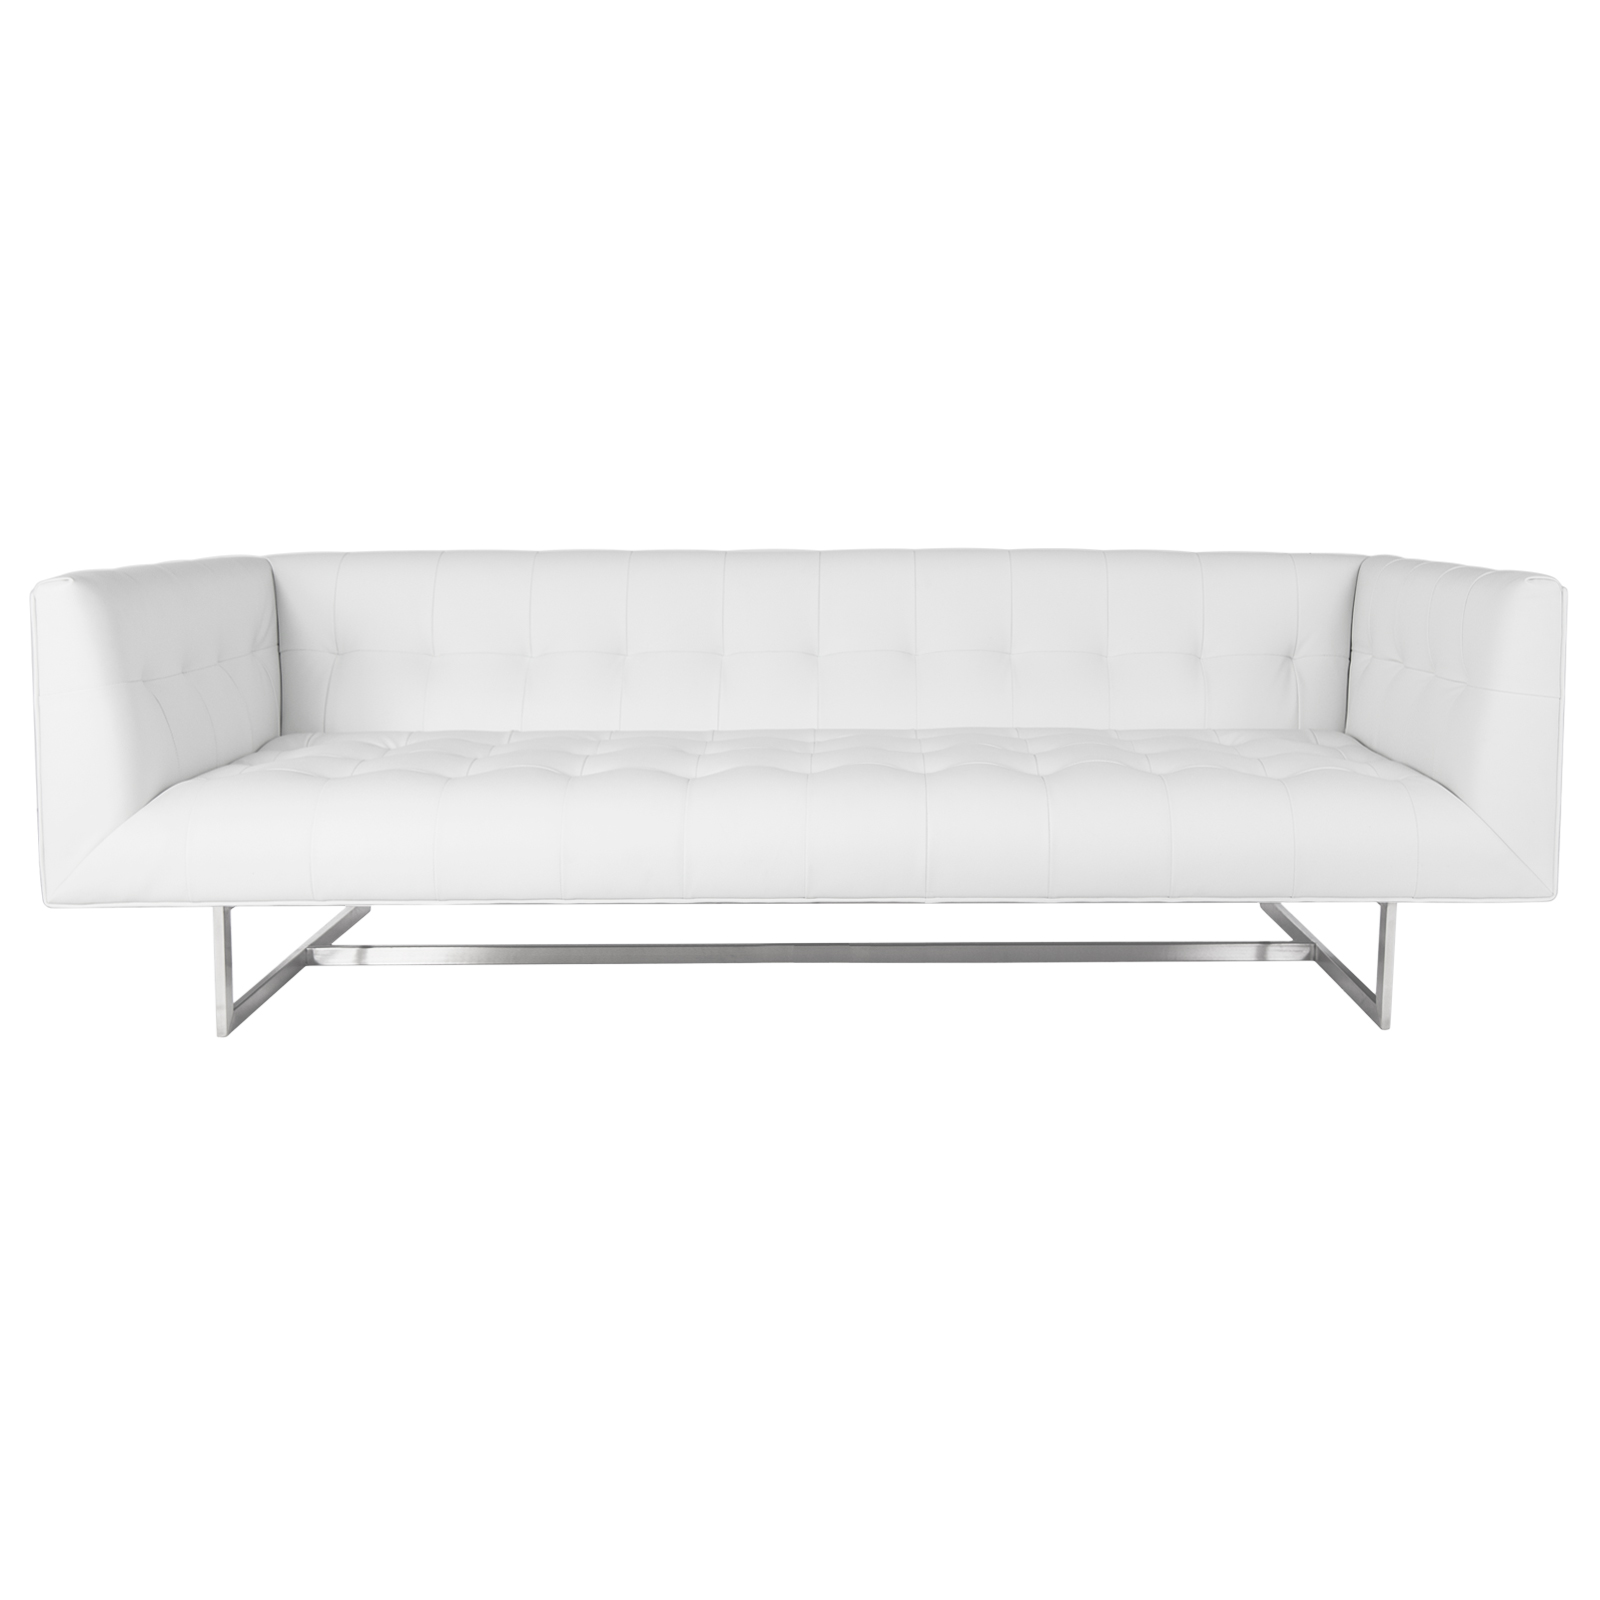 rental sofa foam pads for sofas edward rentals event furniture